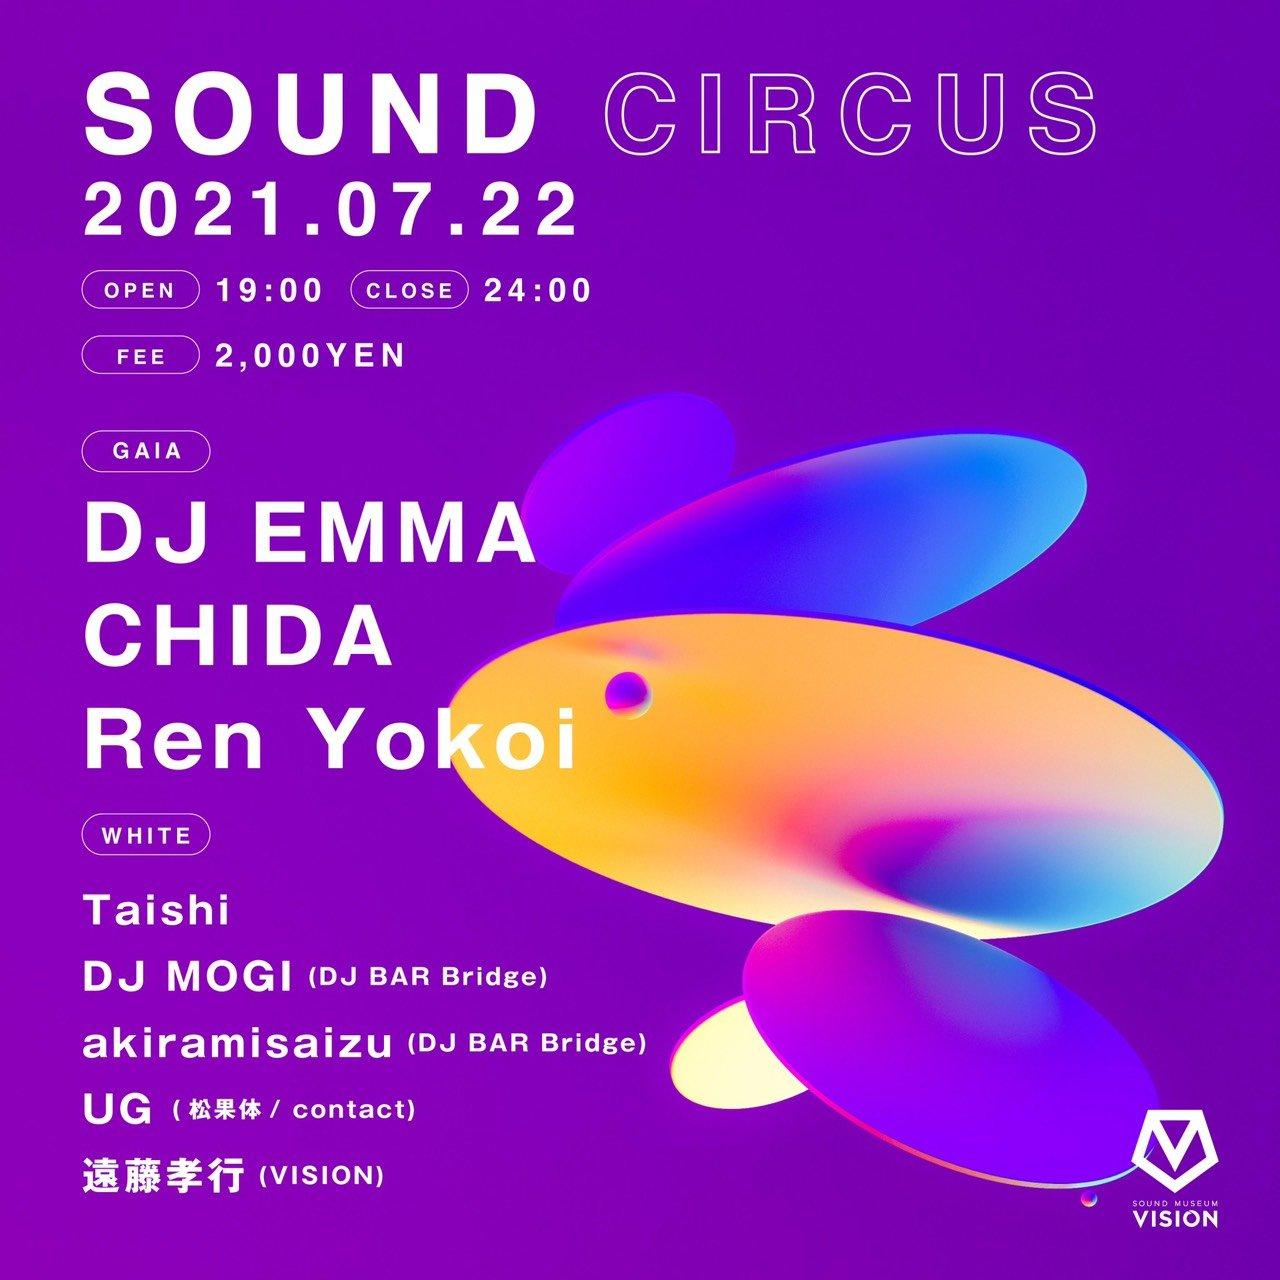 SOUND CIRCUS